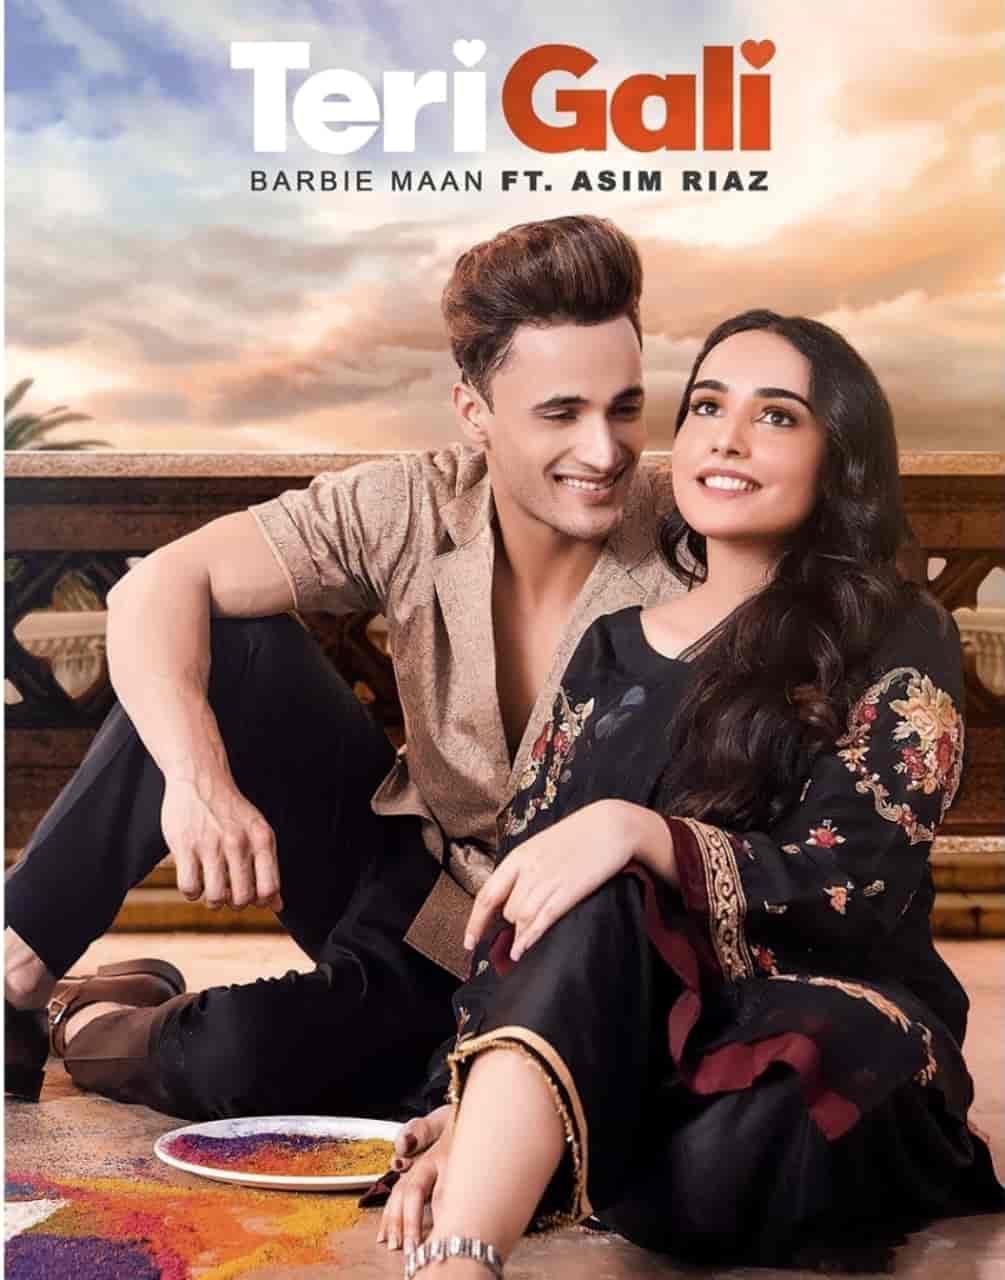 Teri Gali Song Image Features Asim Riaz and Barbie Maan